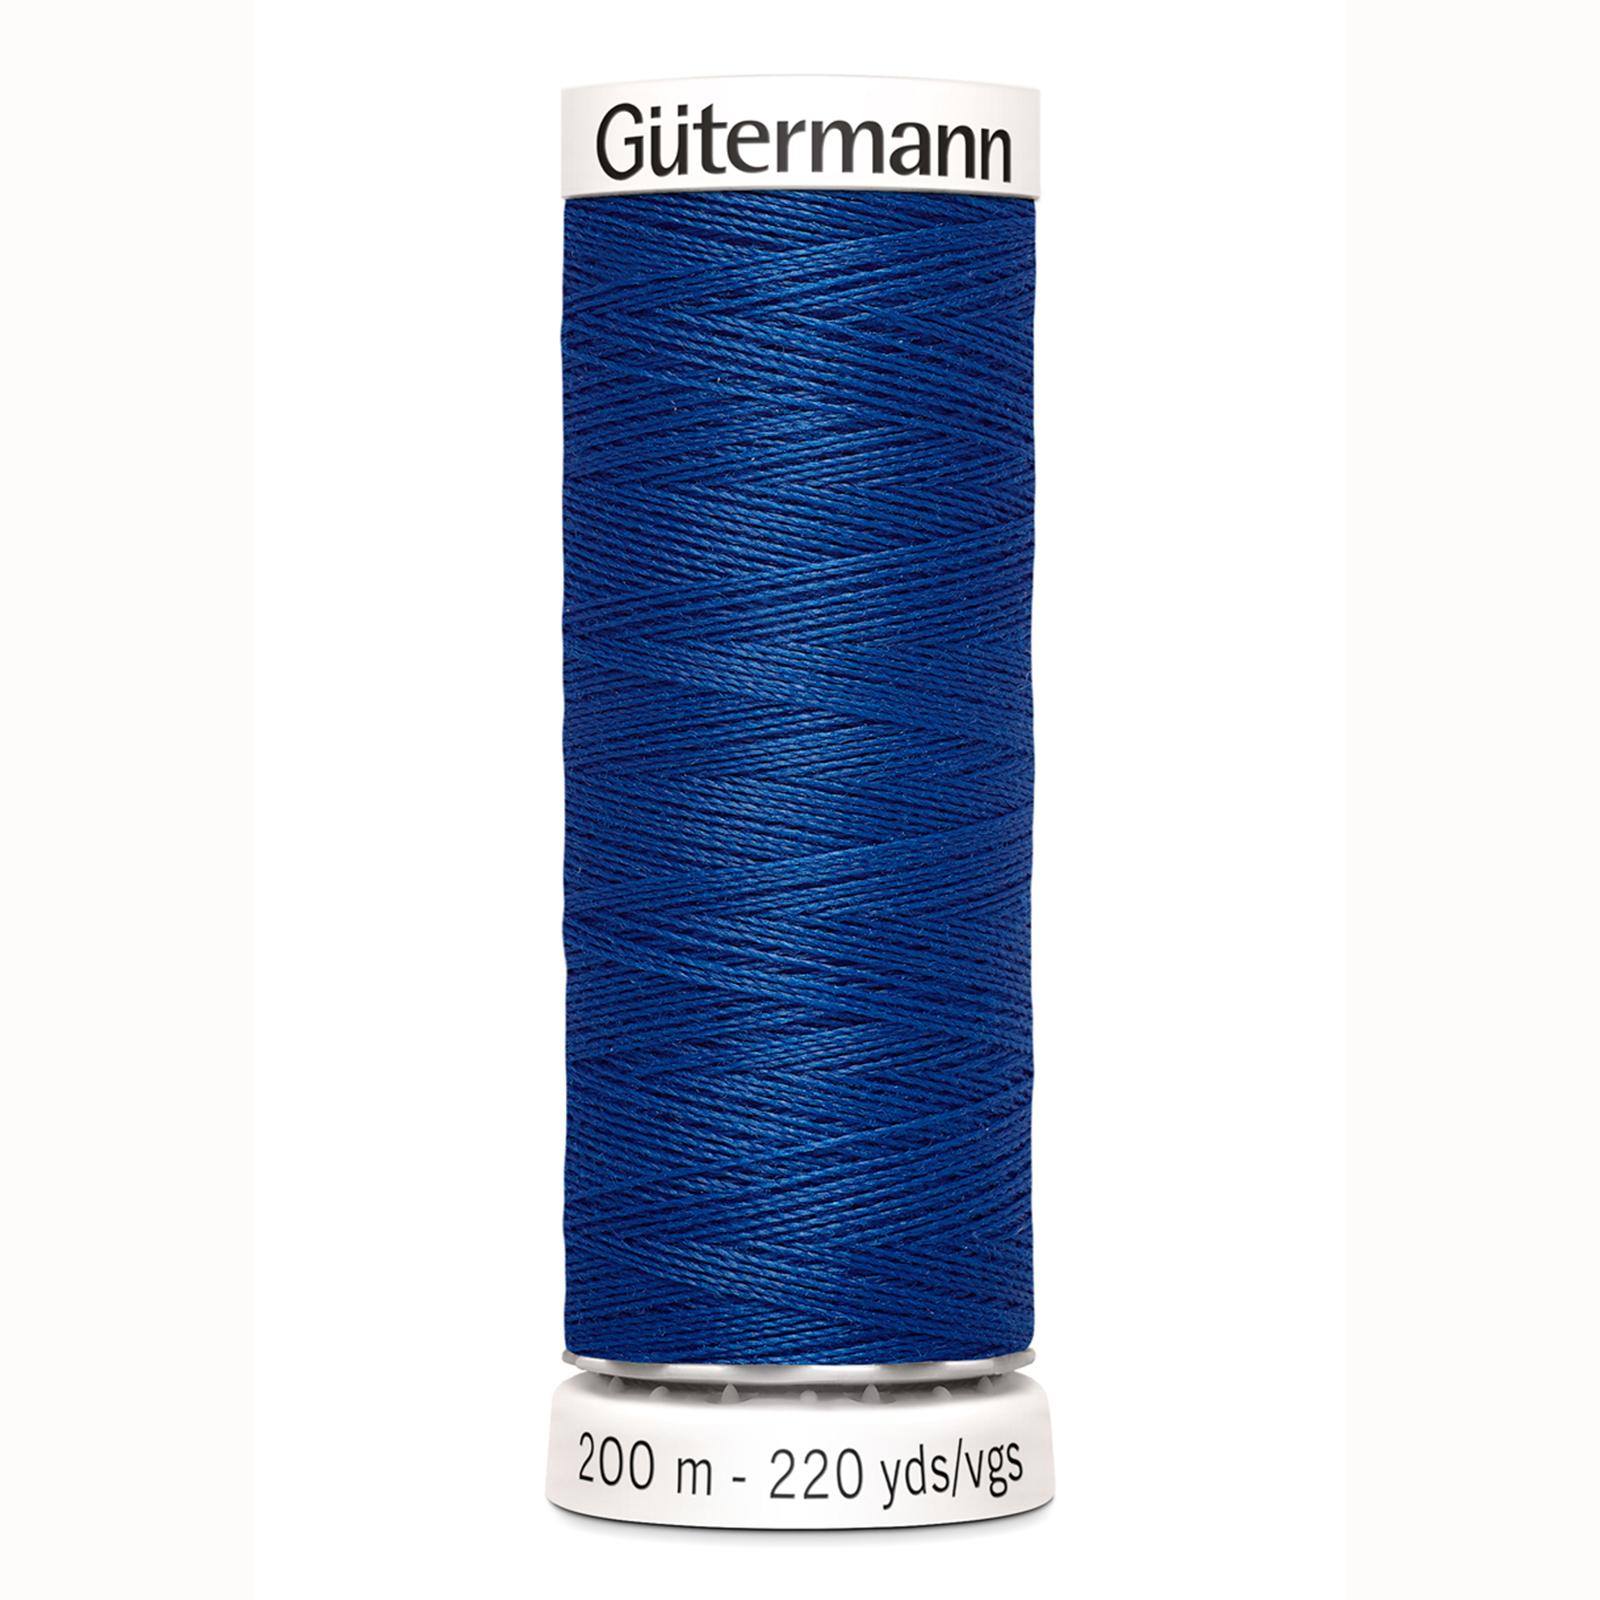 Gutermann Polyestr 200m-214